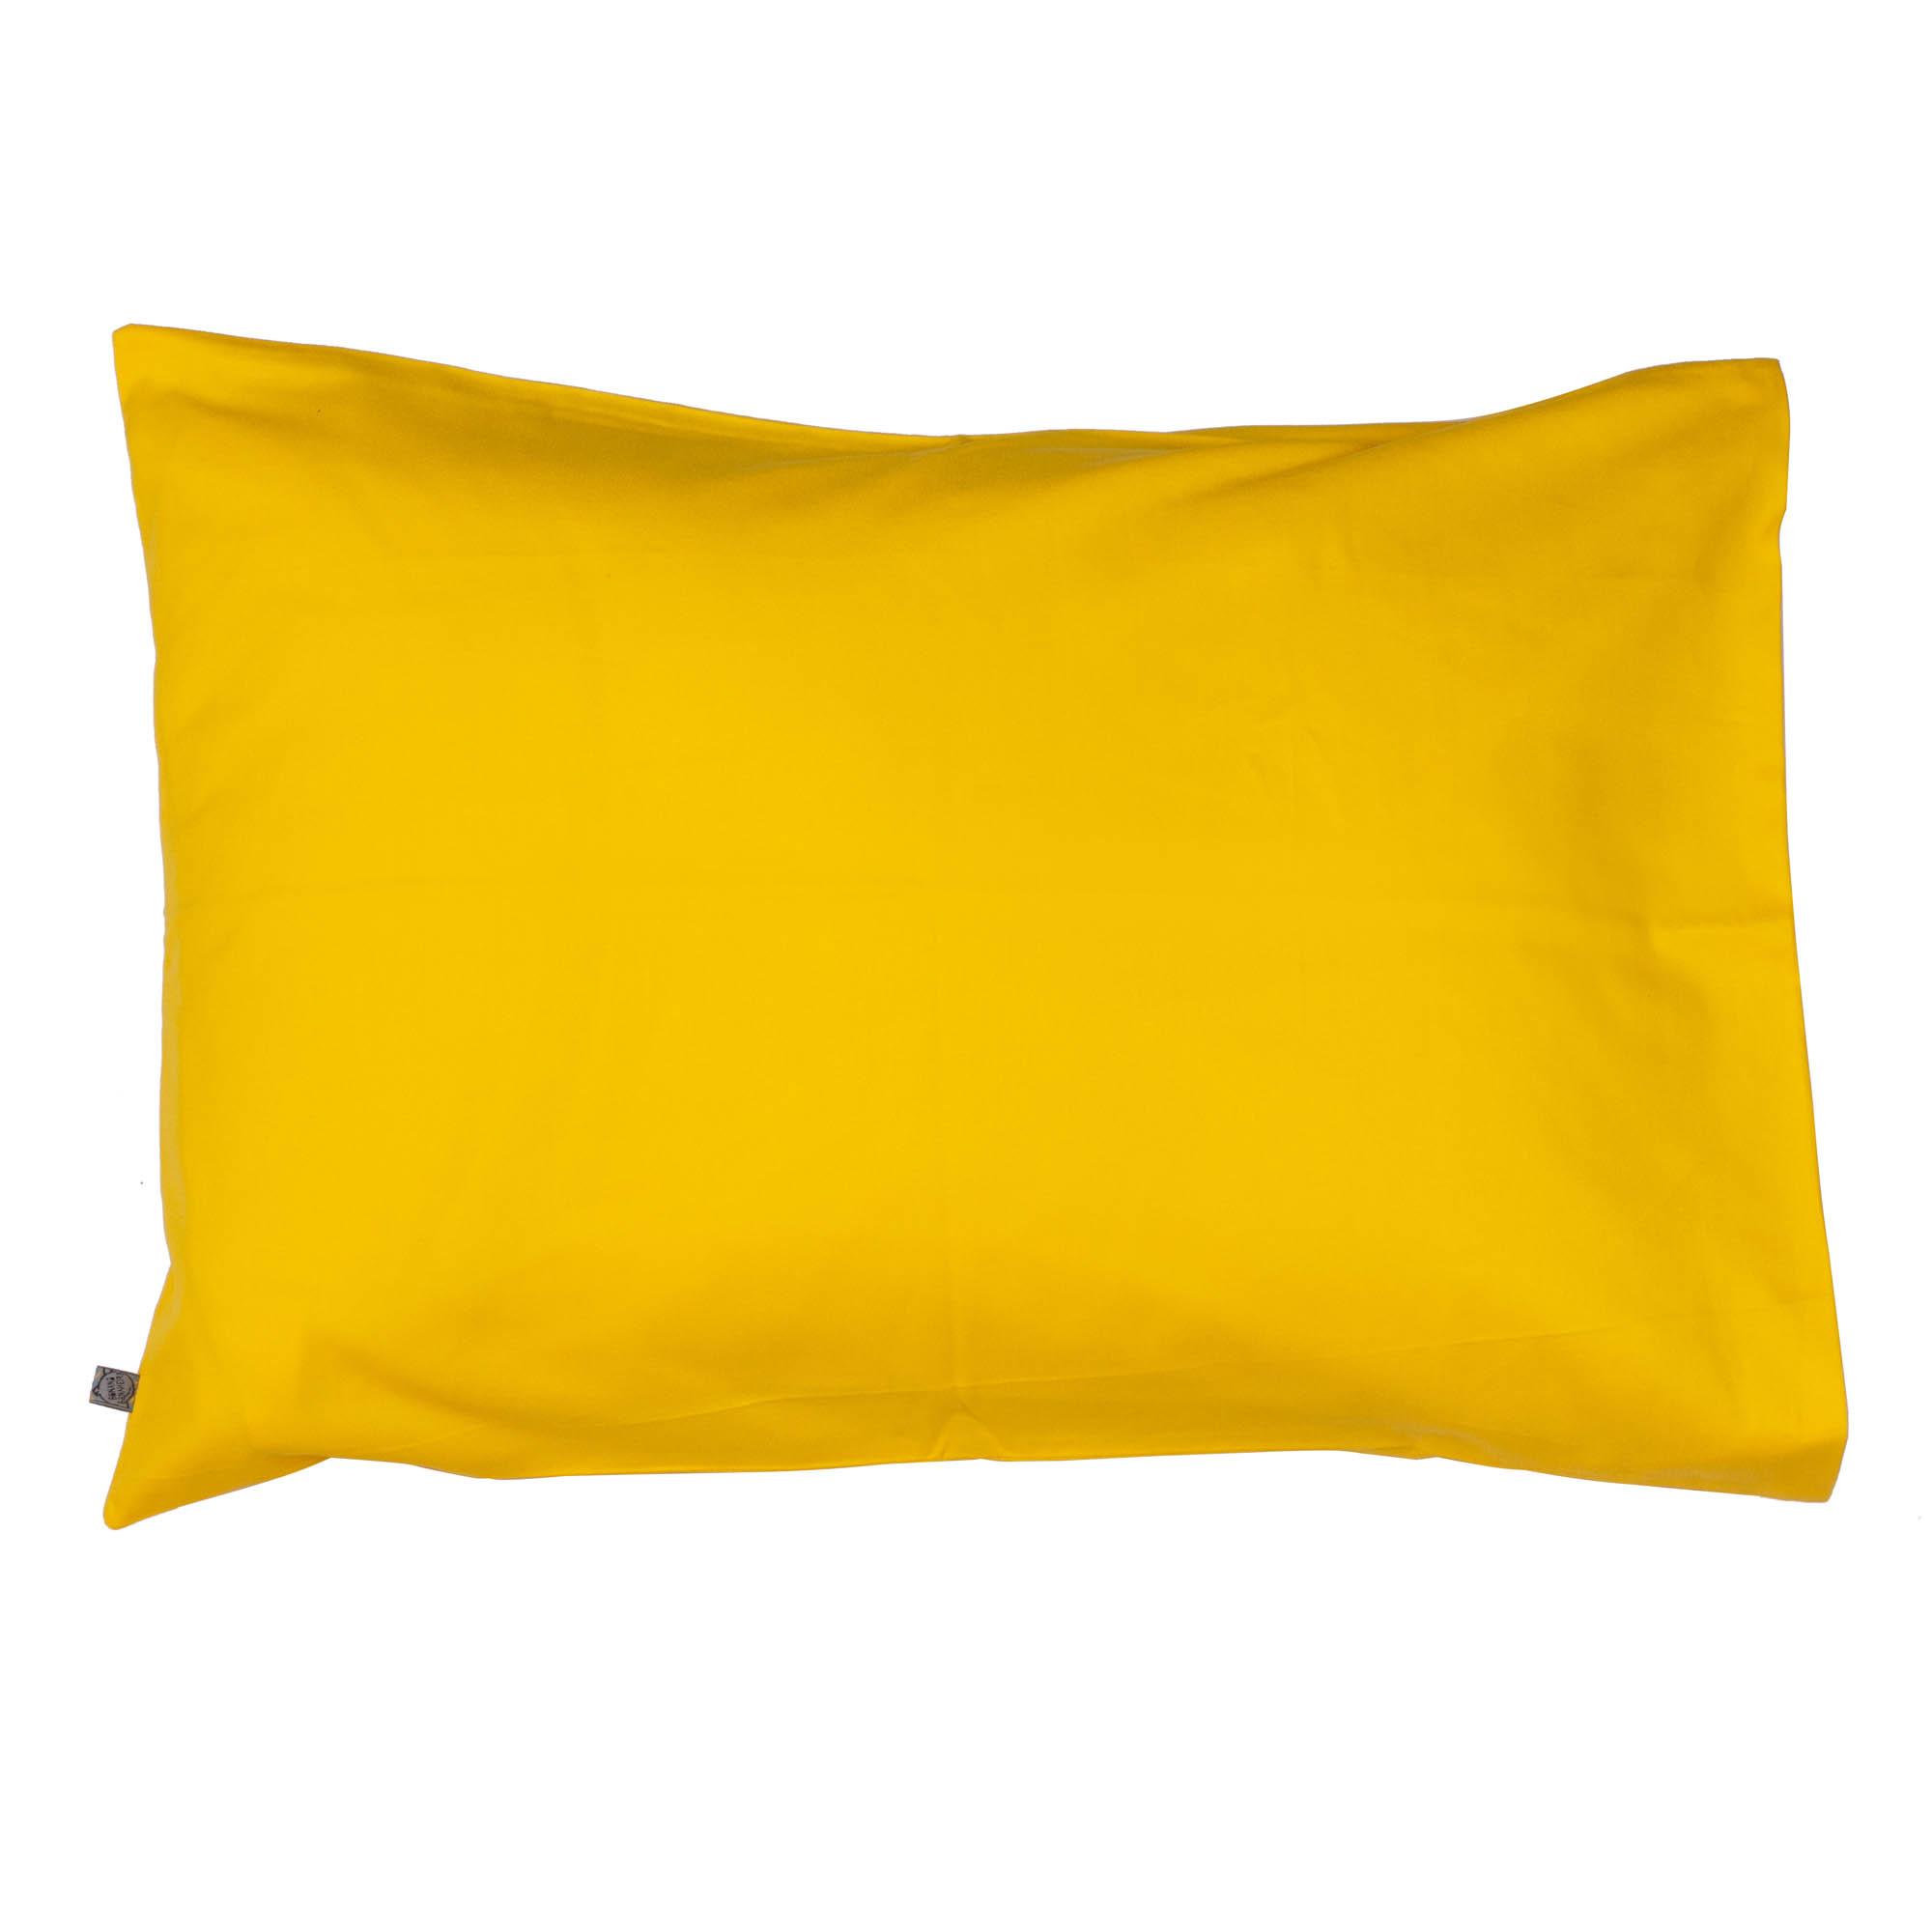 Porta travesseiro liso amarelo